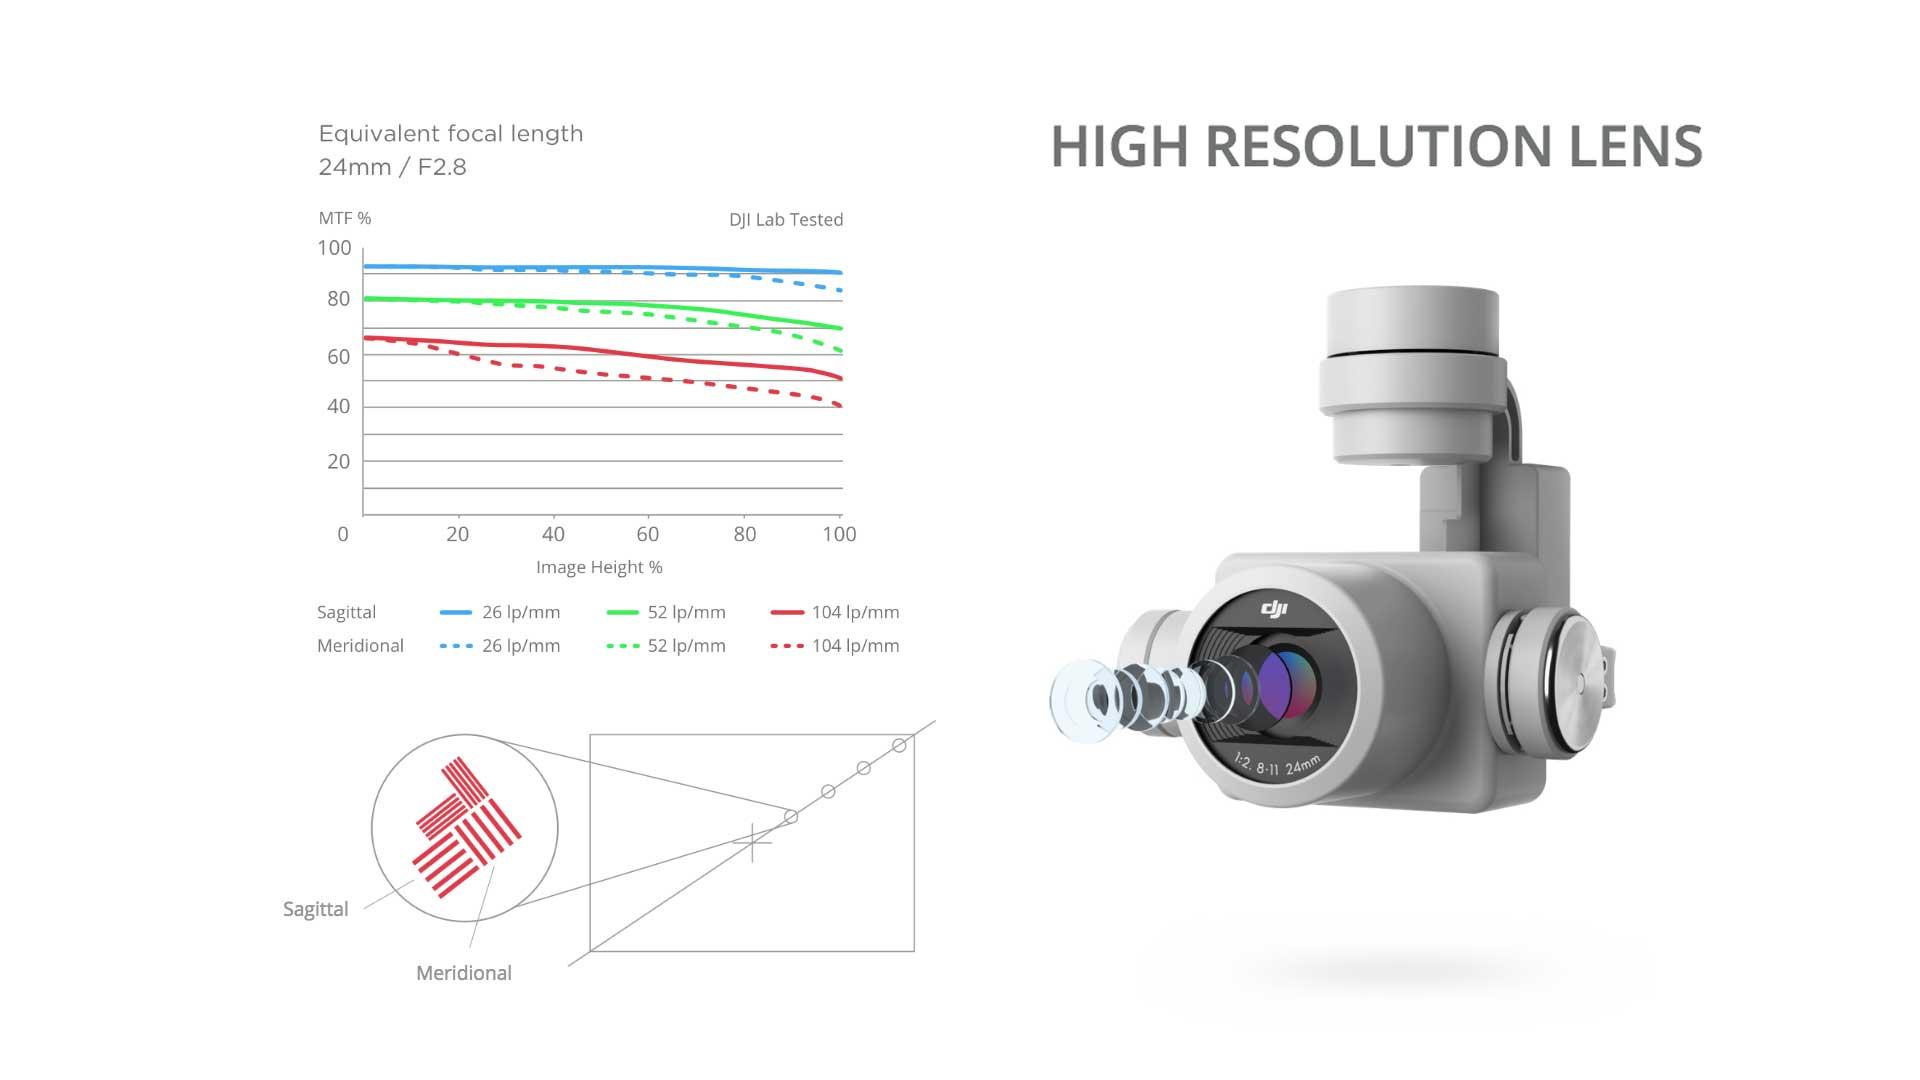 DJI Phantom 4 Pro V2.0 HIGH RESOLUTION LENS